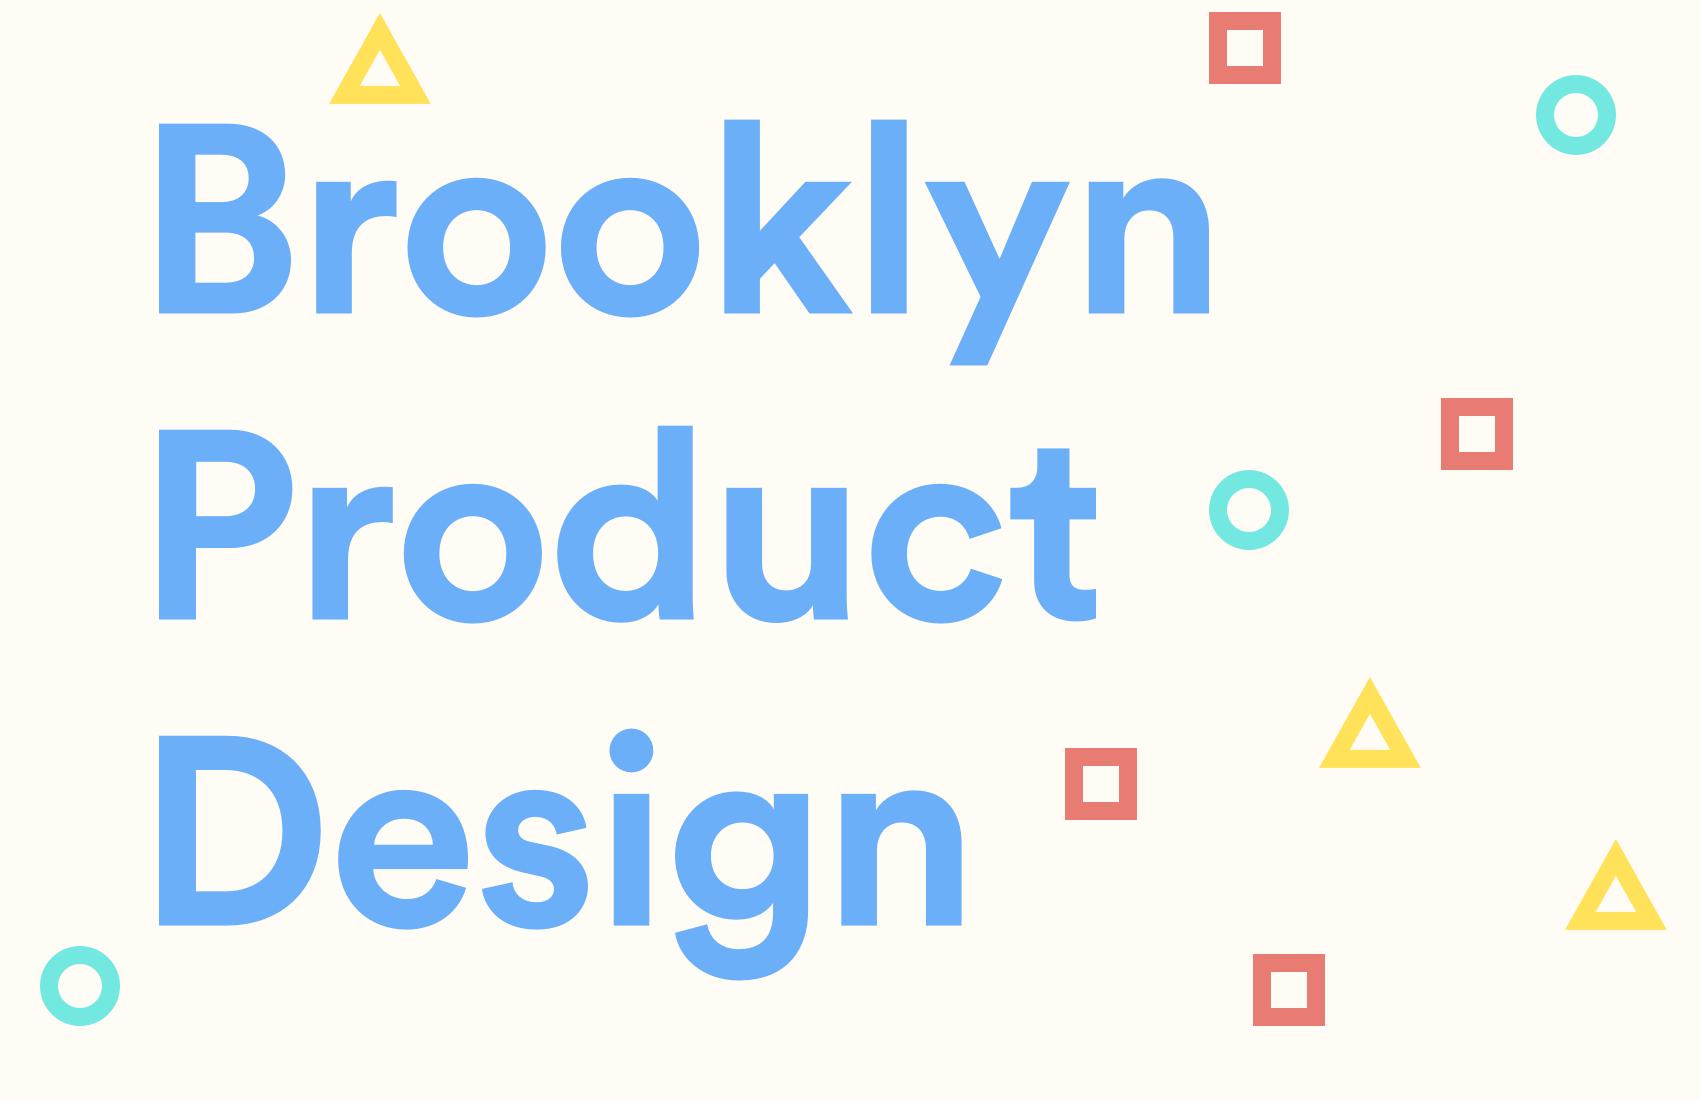 Brooklyn Product Design